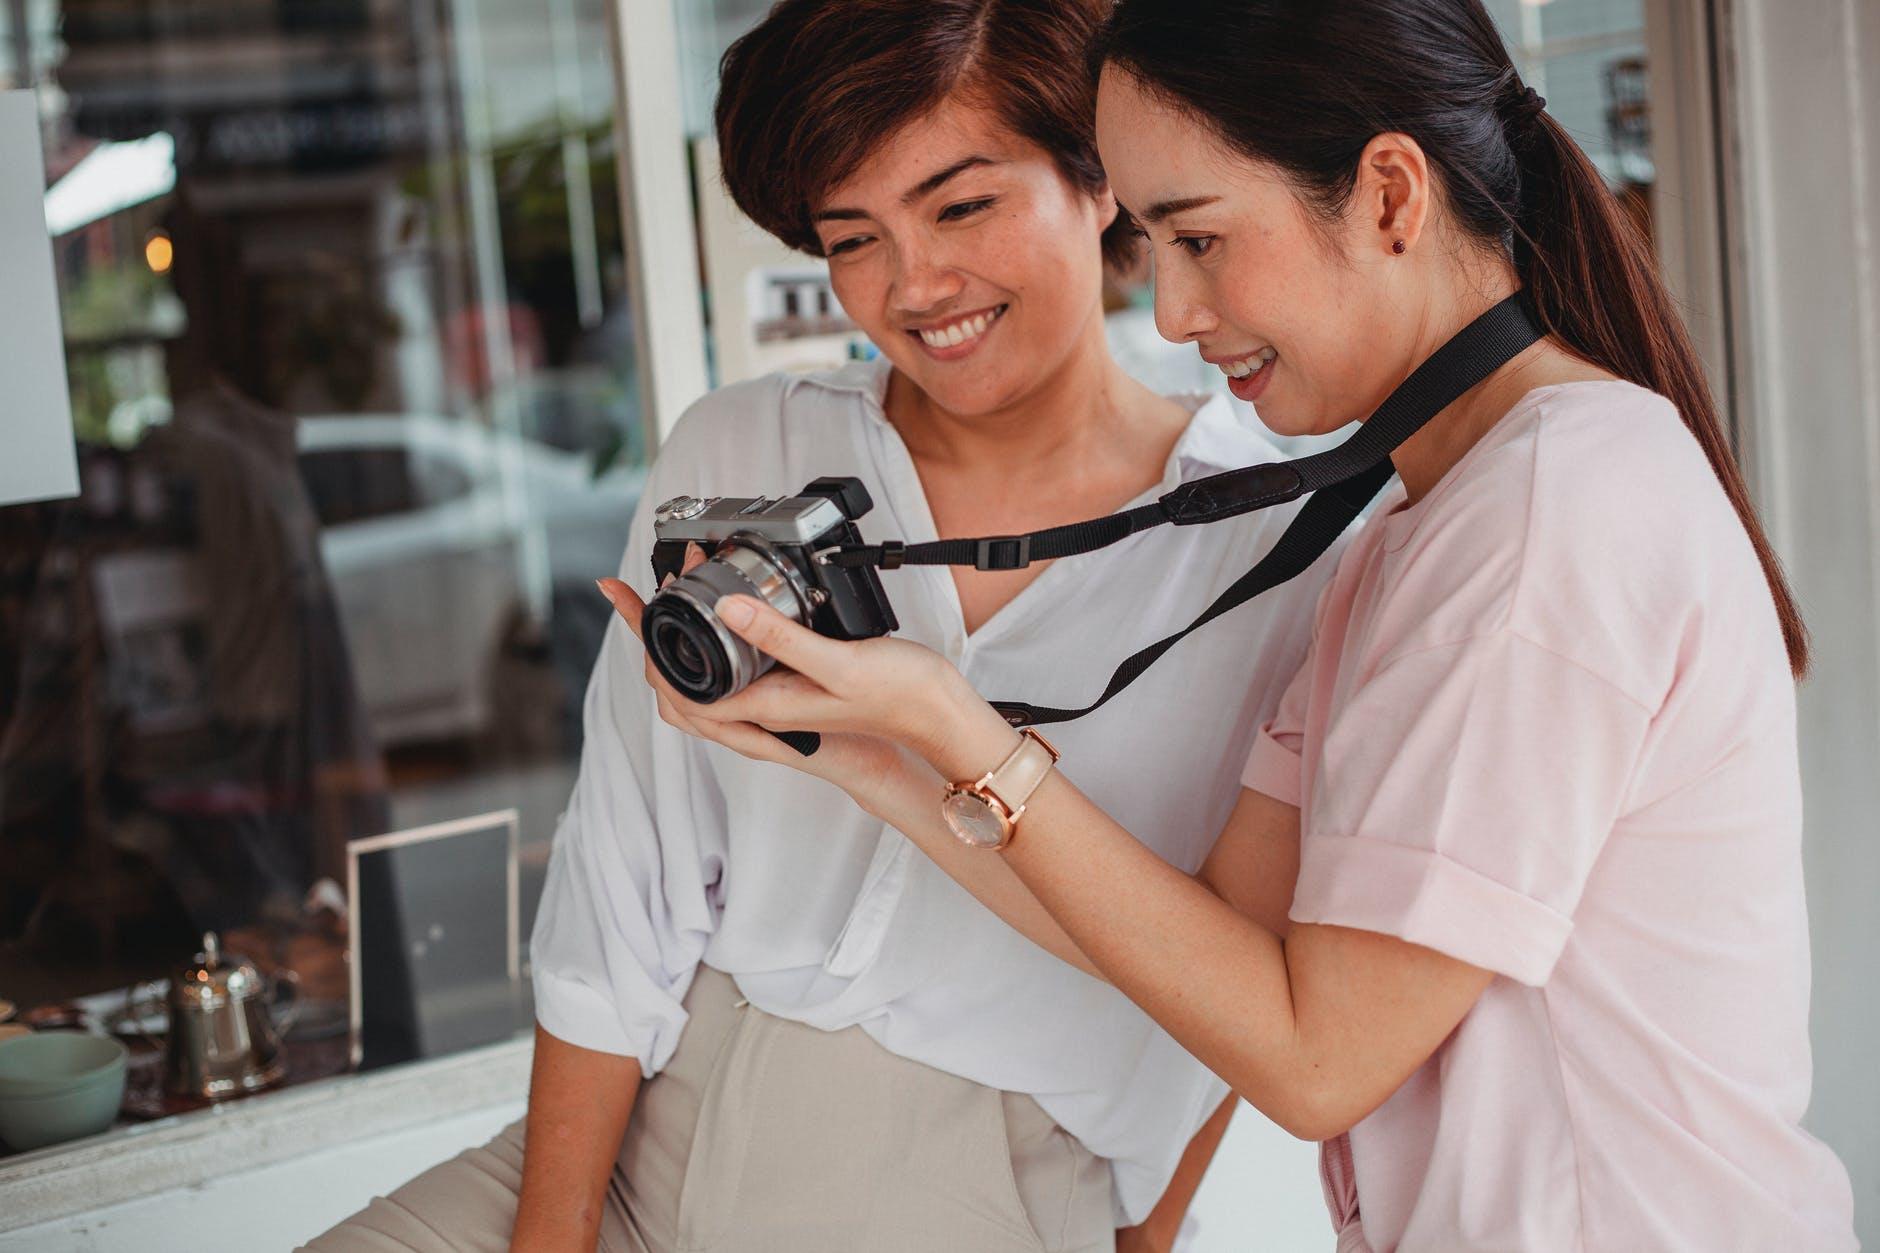 crop happy asian girlfriends sharing photo camera on city street